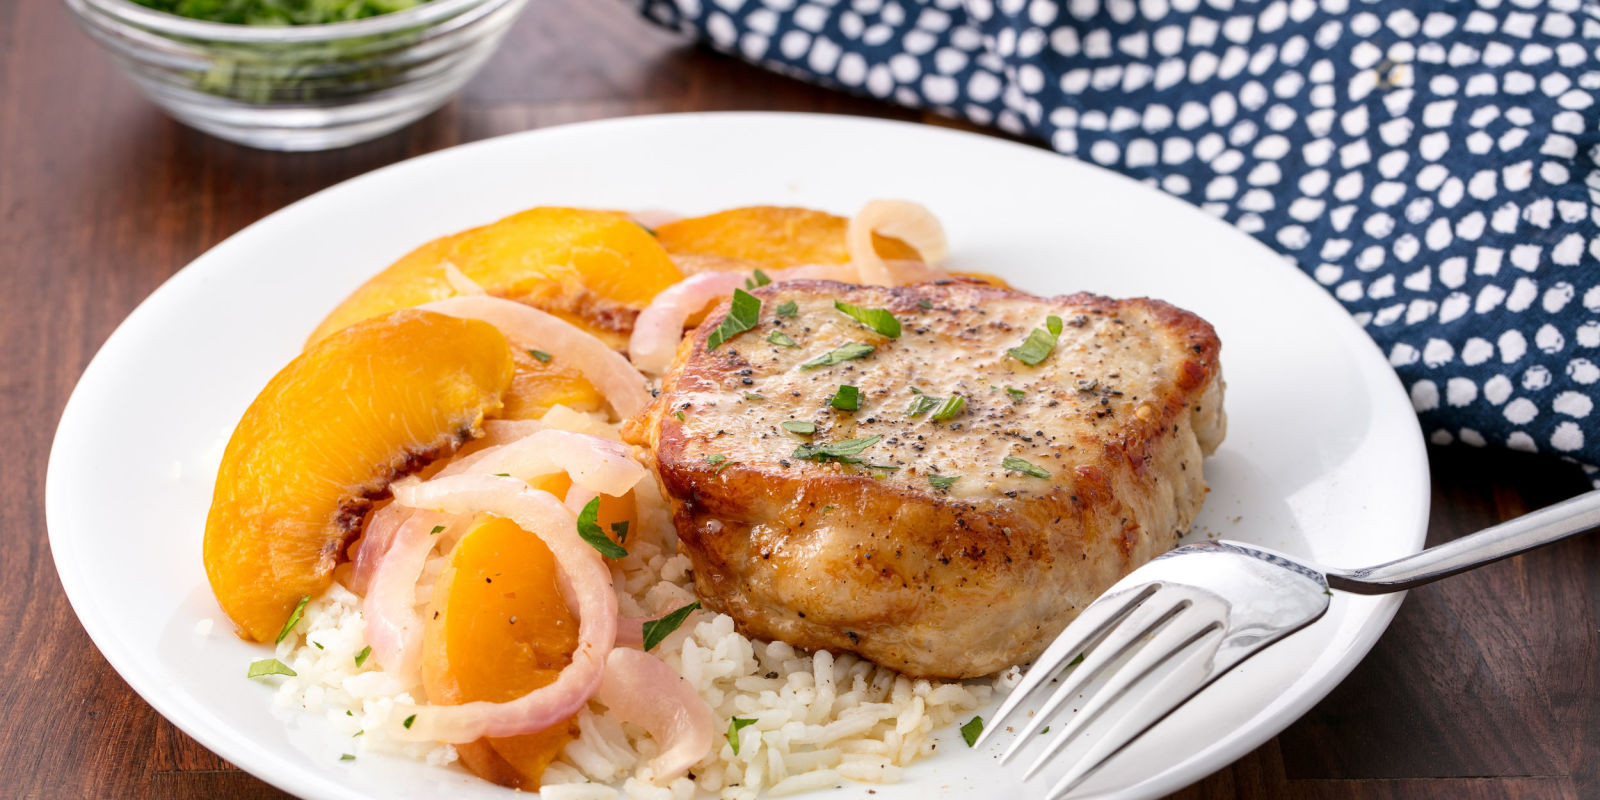 Healthy Crock Pot Pork Chops  Easy Crock Pot Pork Chops Recipe How to Cook Pork Chops